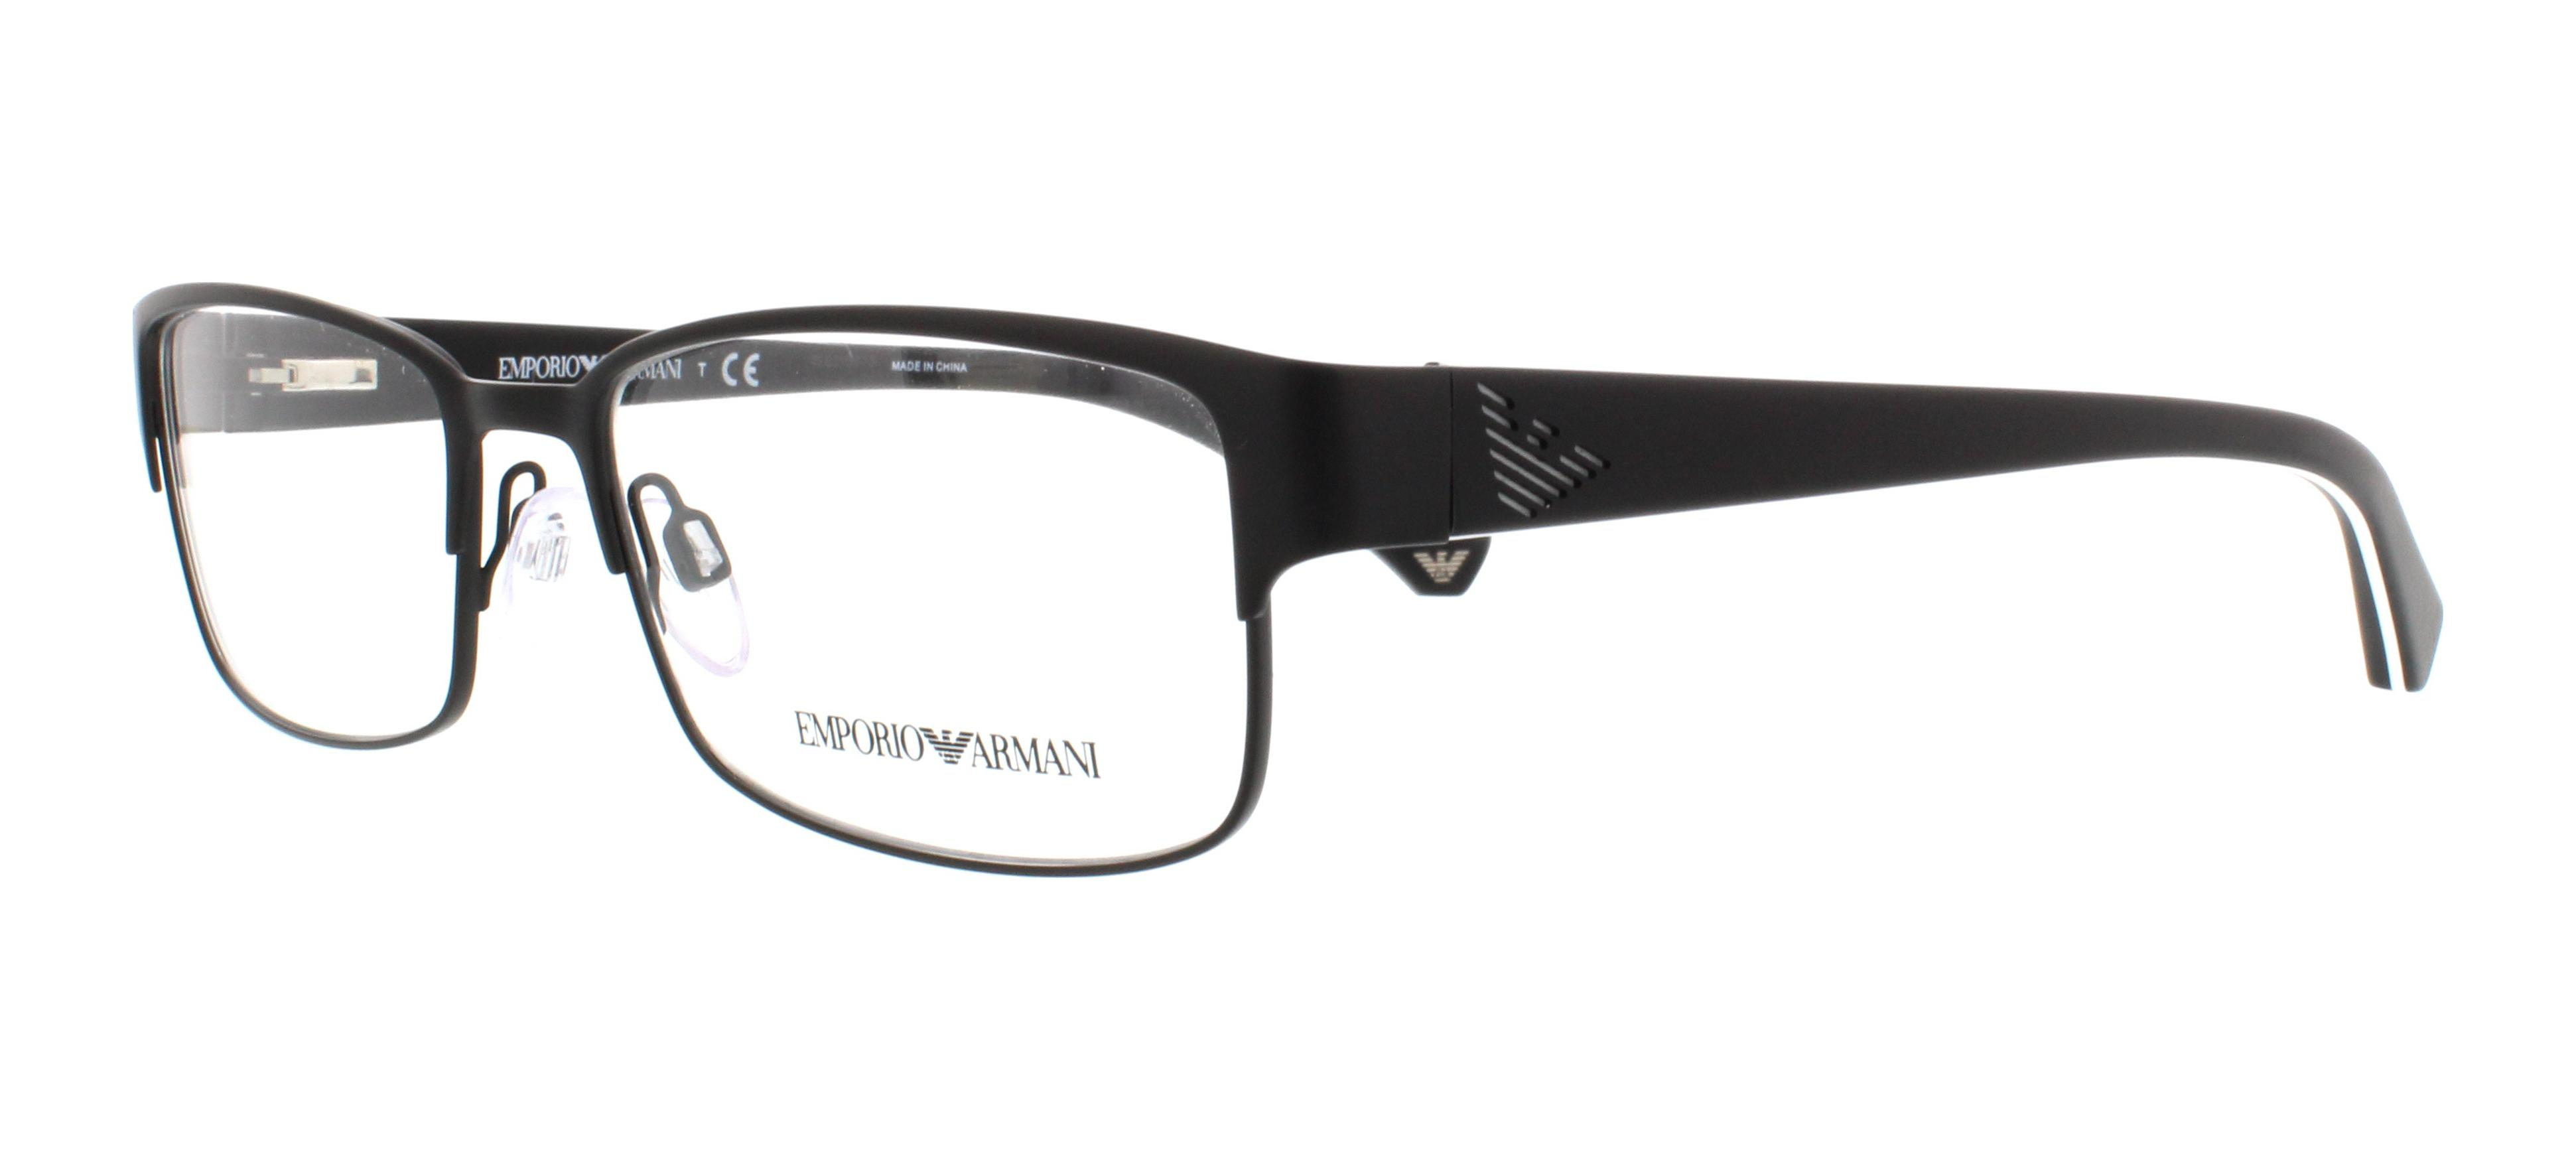 emporio armani eyeglasses ea1036 3109 matte black 55mm - Emporio Armani Frames